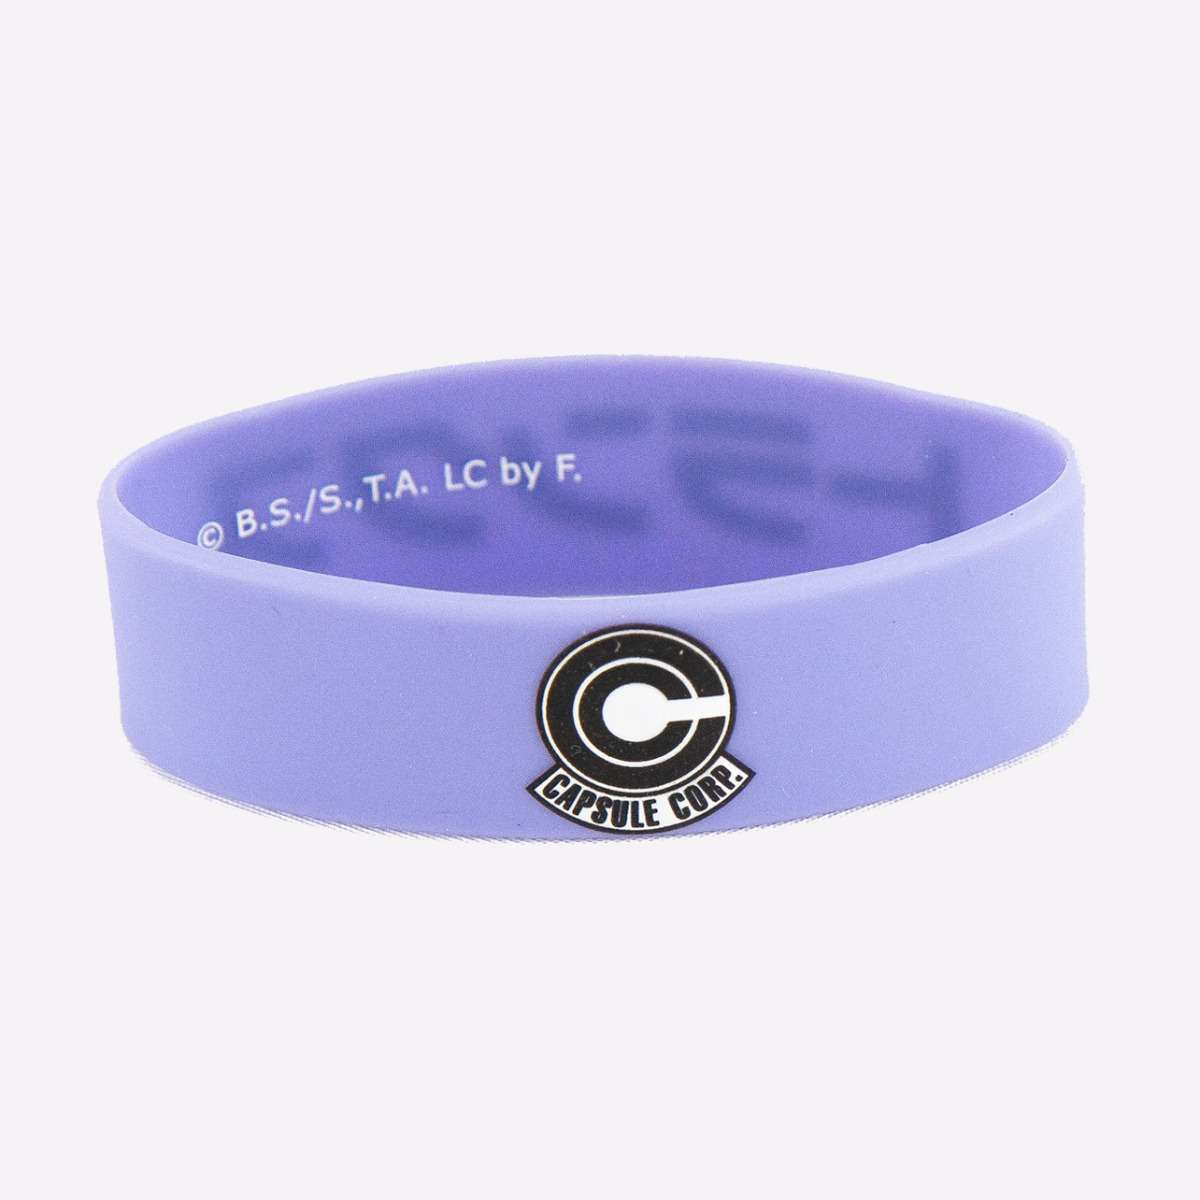 Capsule PVC Wristband accessories